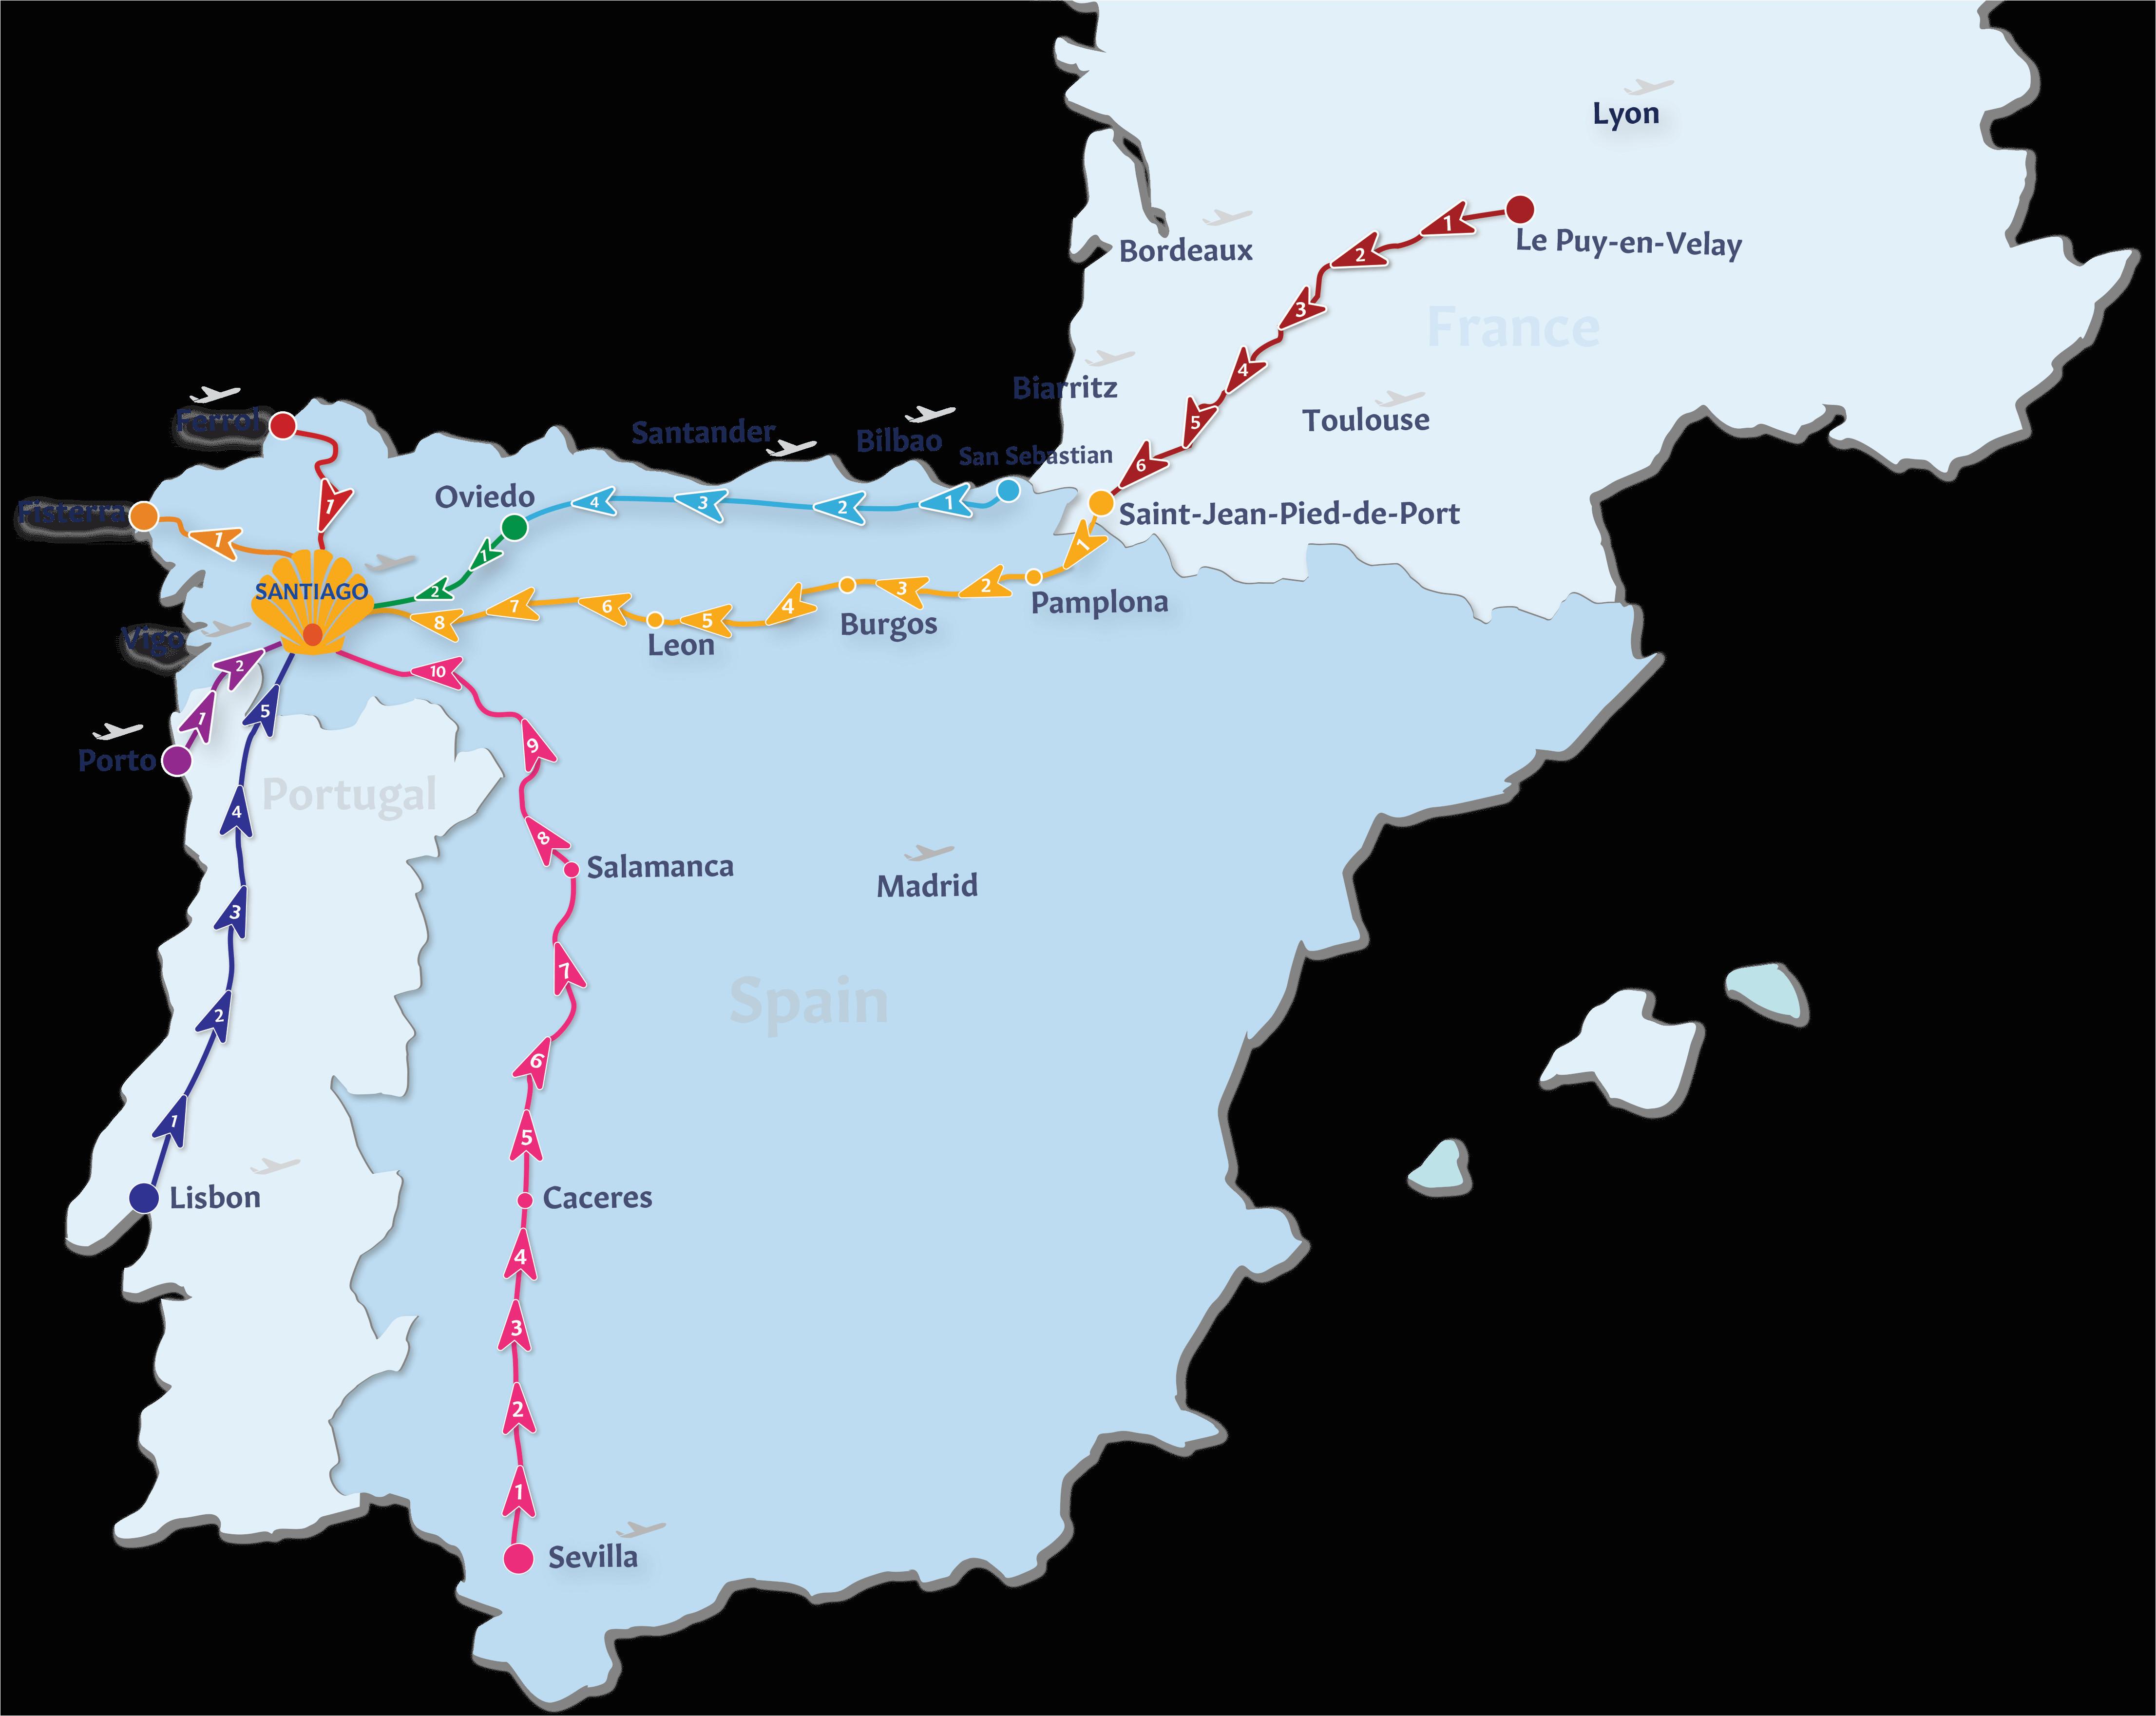 Southwest Michigan Wine Trail Map Camino De Santiago Routes ... on